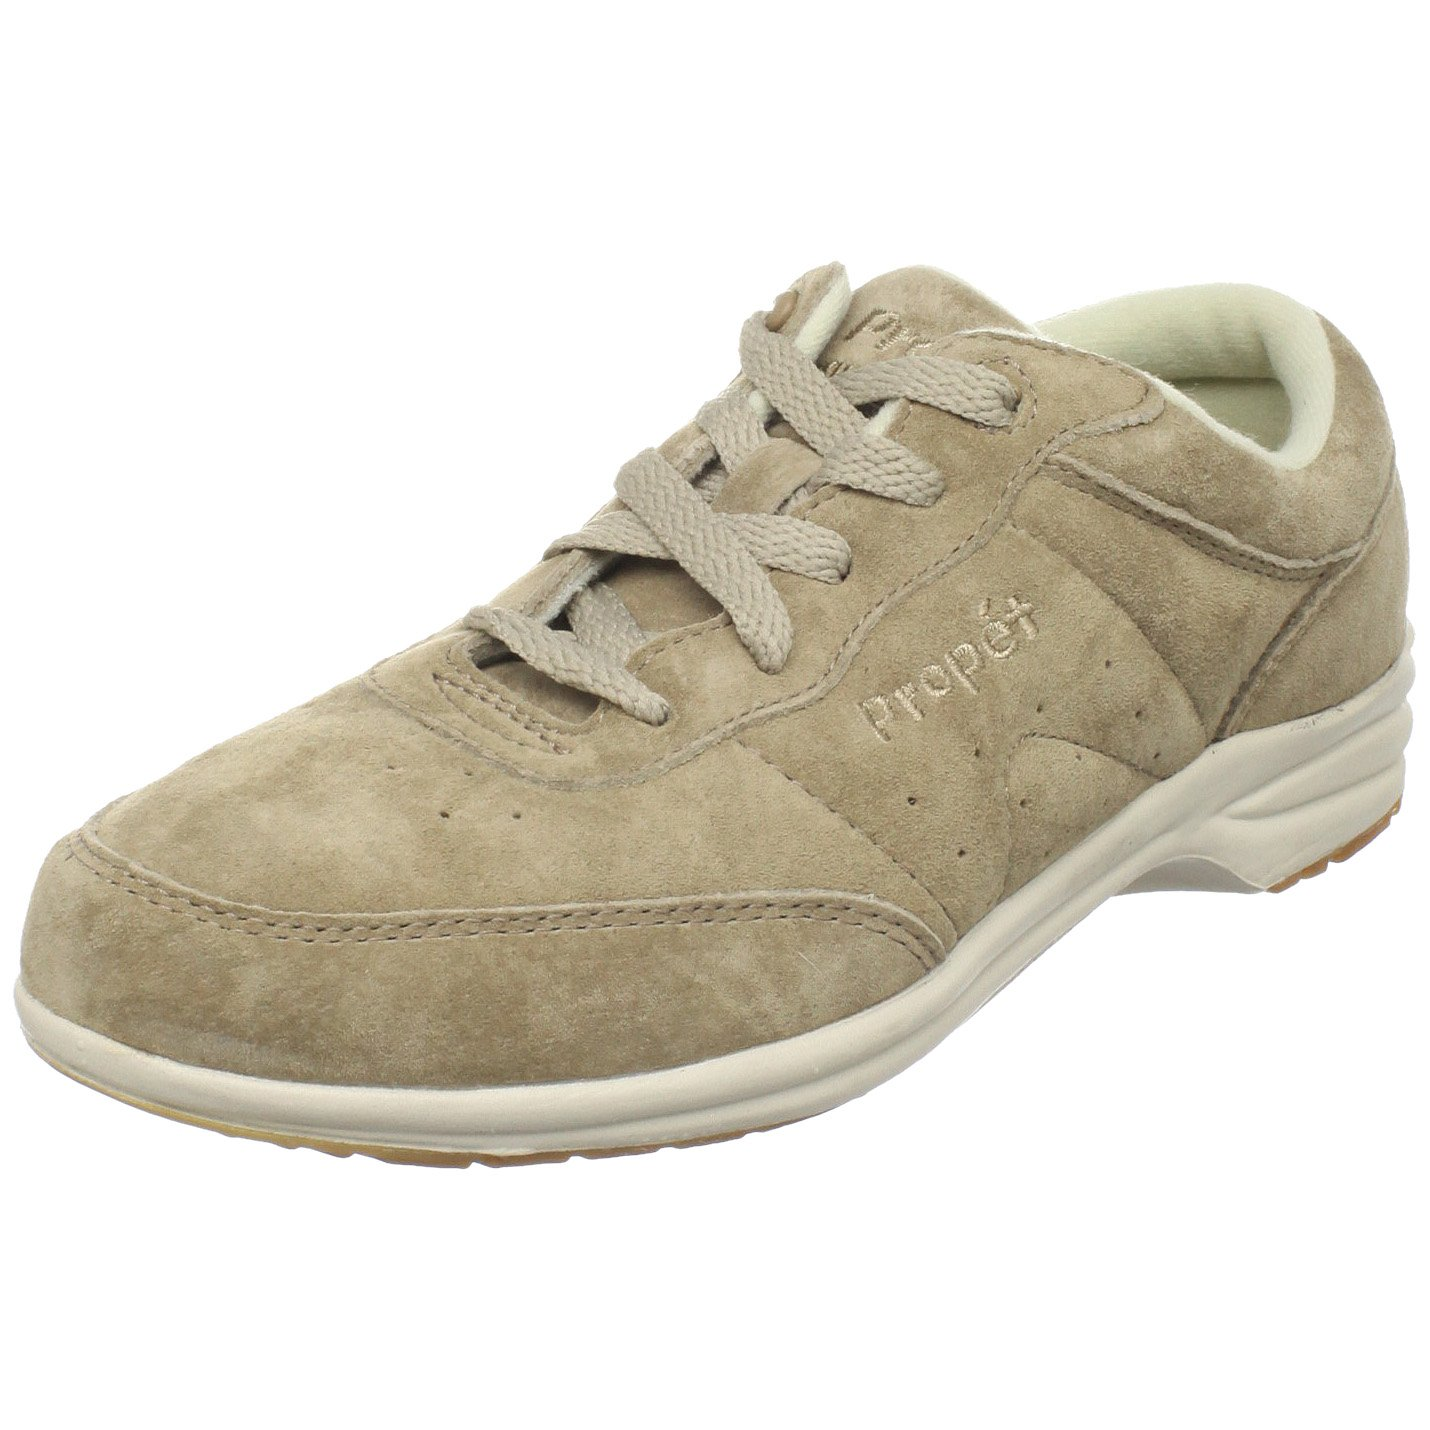 Propet Women's W3841 Sneaker B003C1PPCM 11 2E US|Classic Taupe